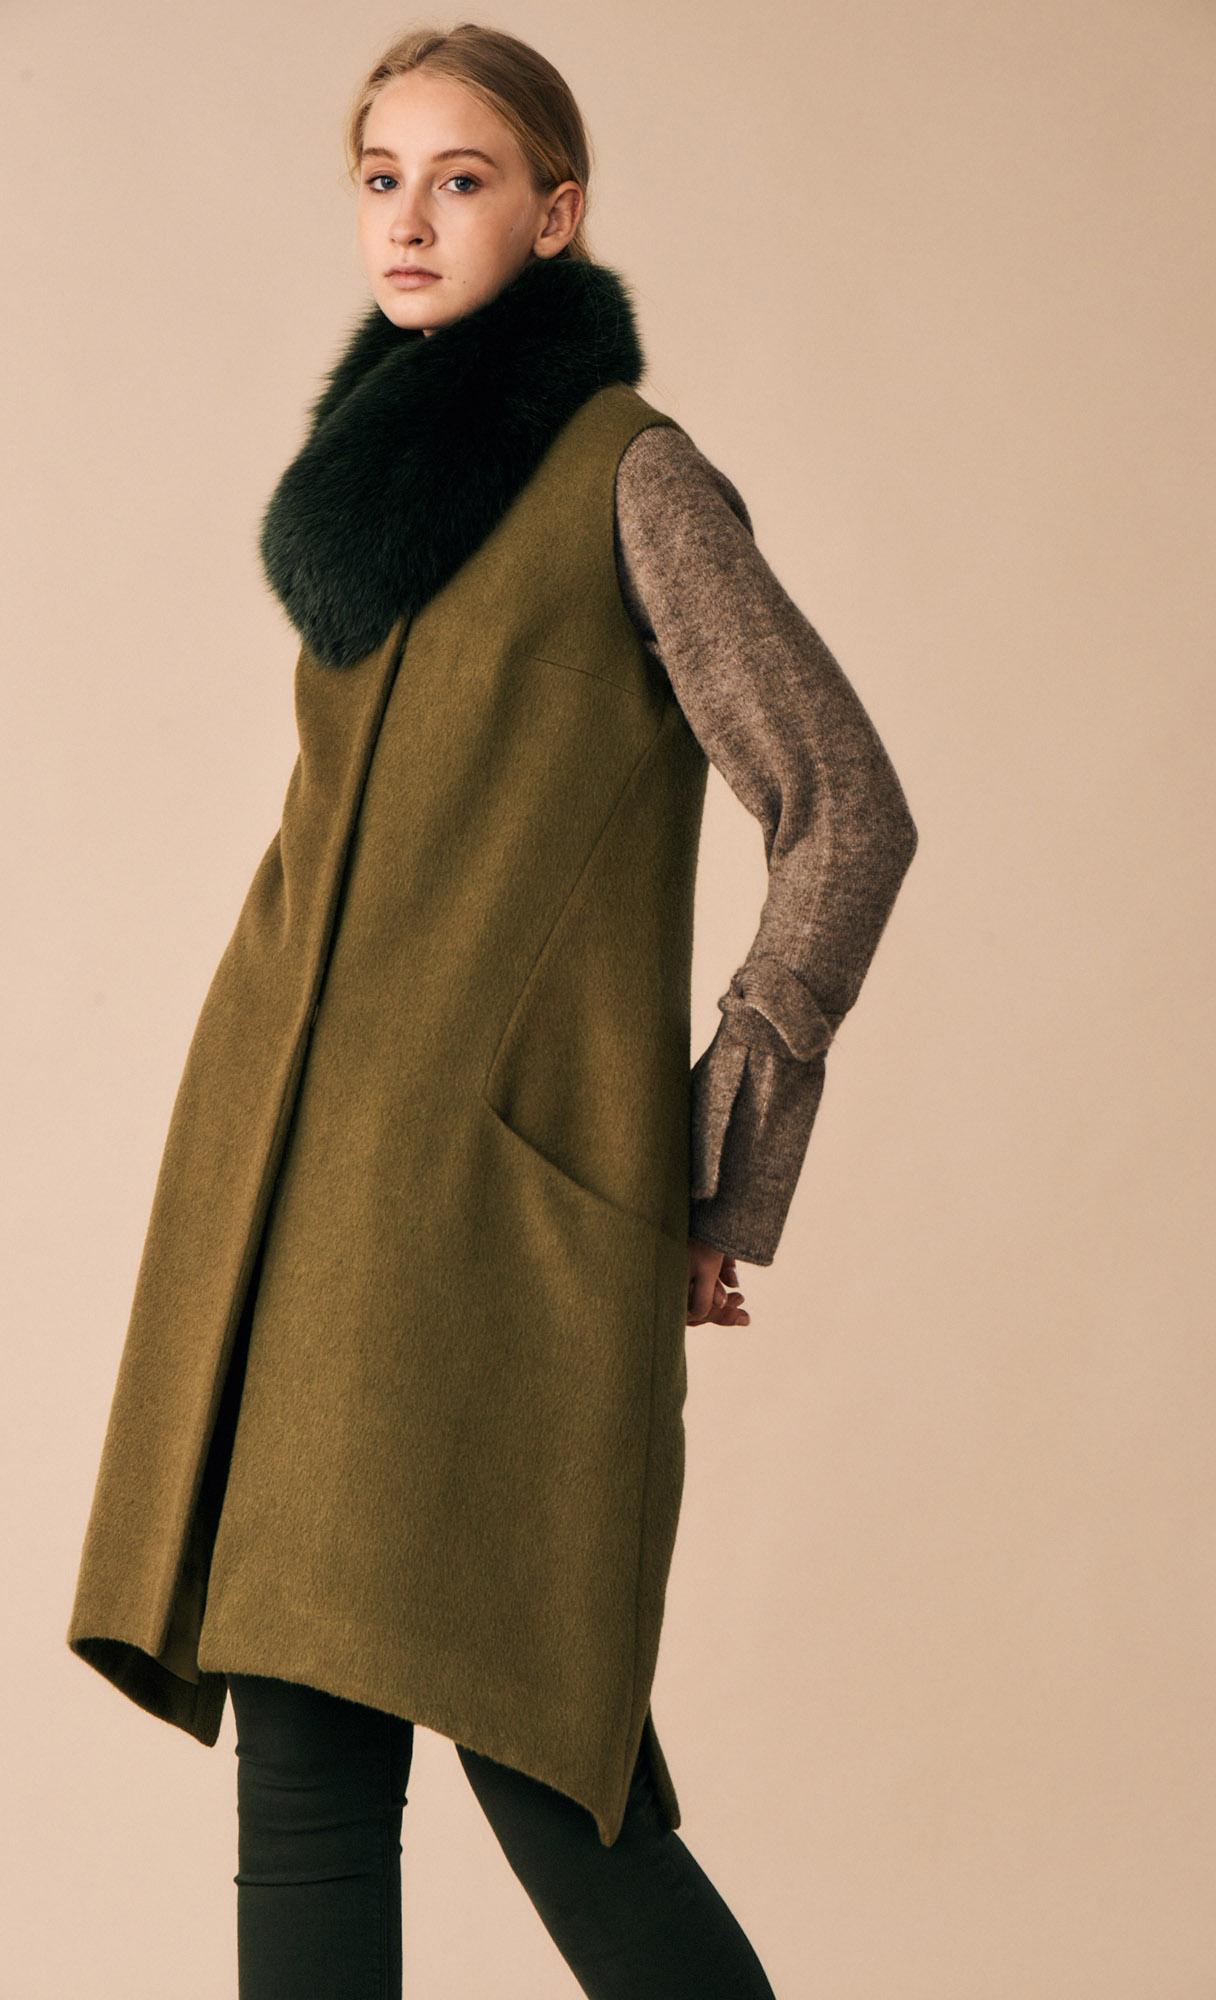 COAT SANDRA AT-316   Colors: olive green, black  Sizes: XS, S, M, L, XL